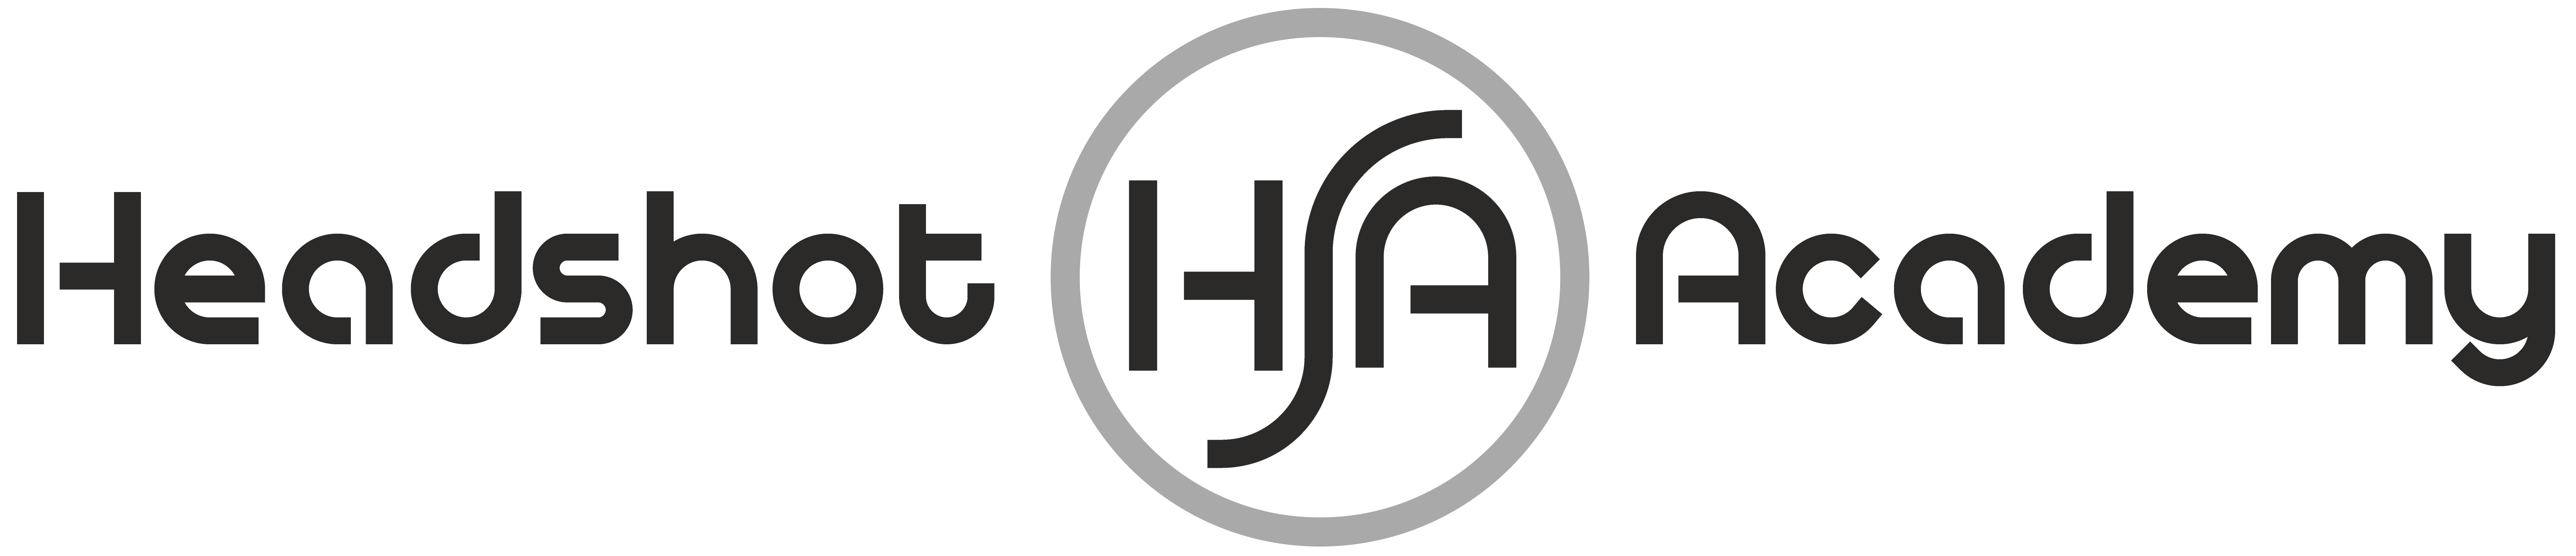 Headshot Academy logo